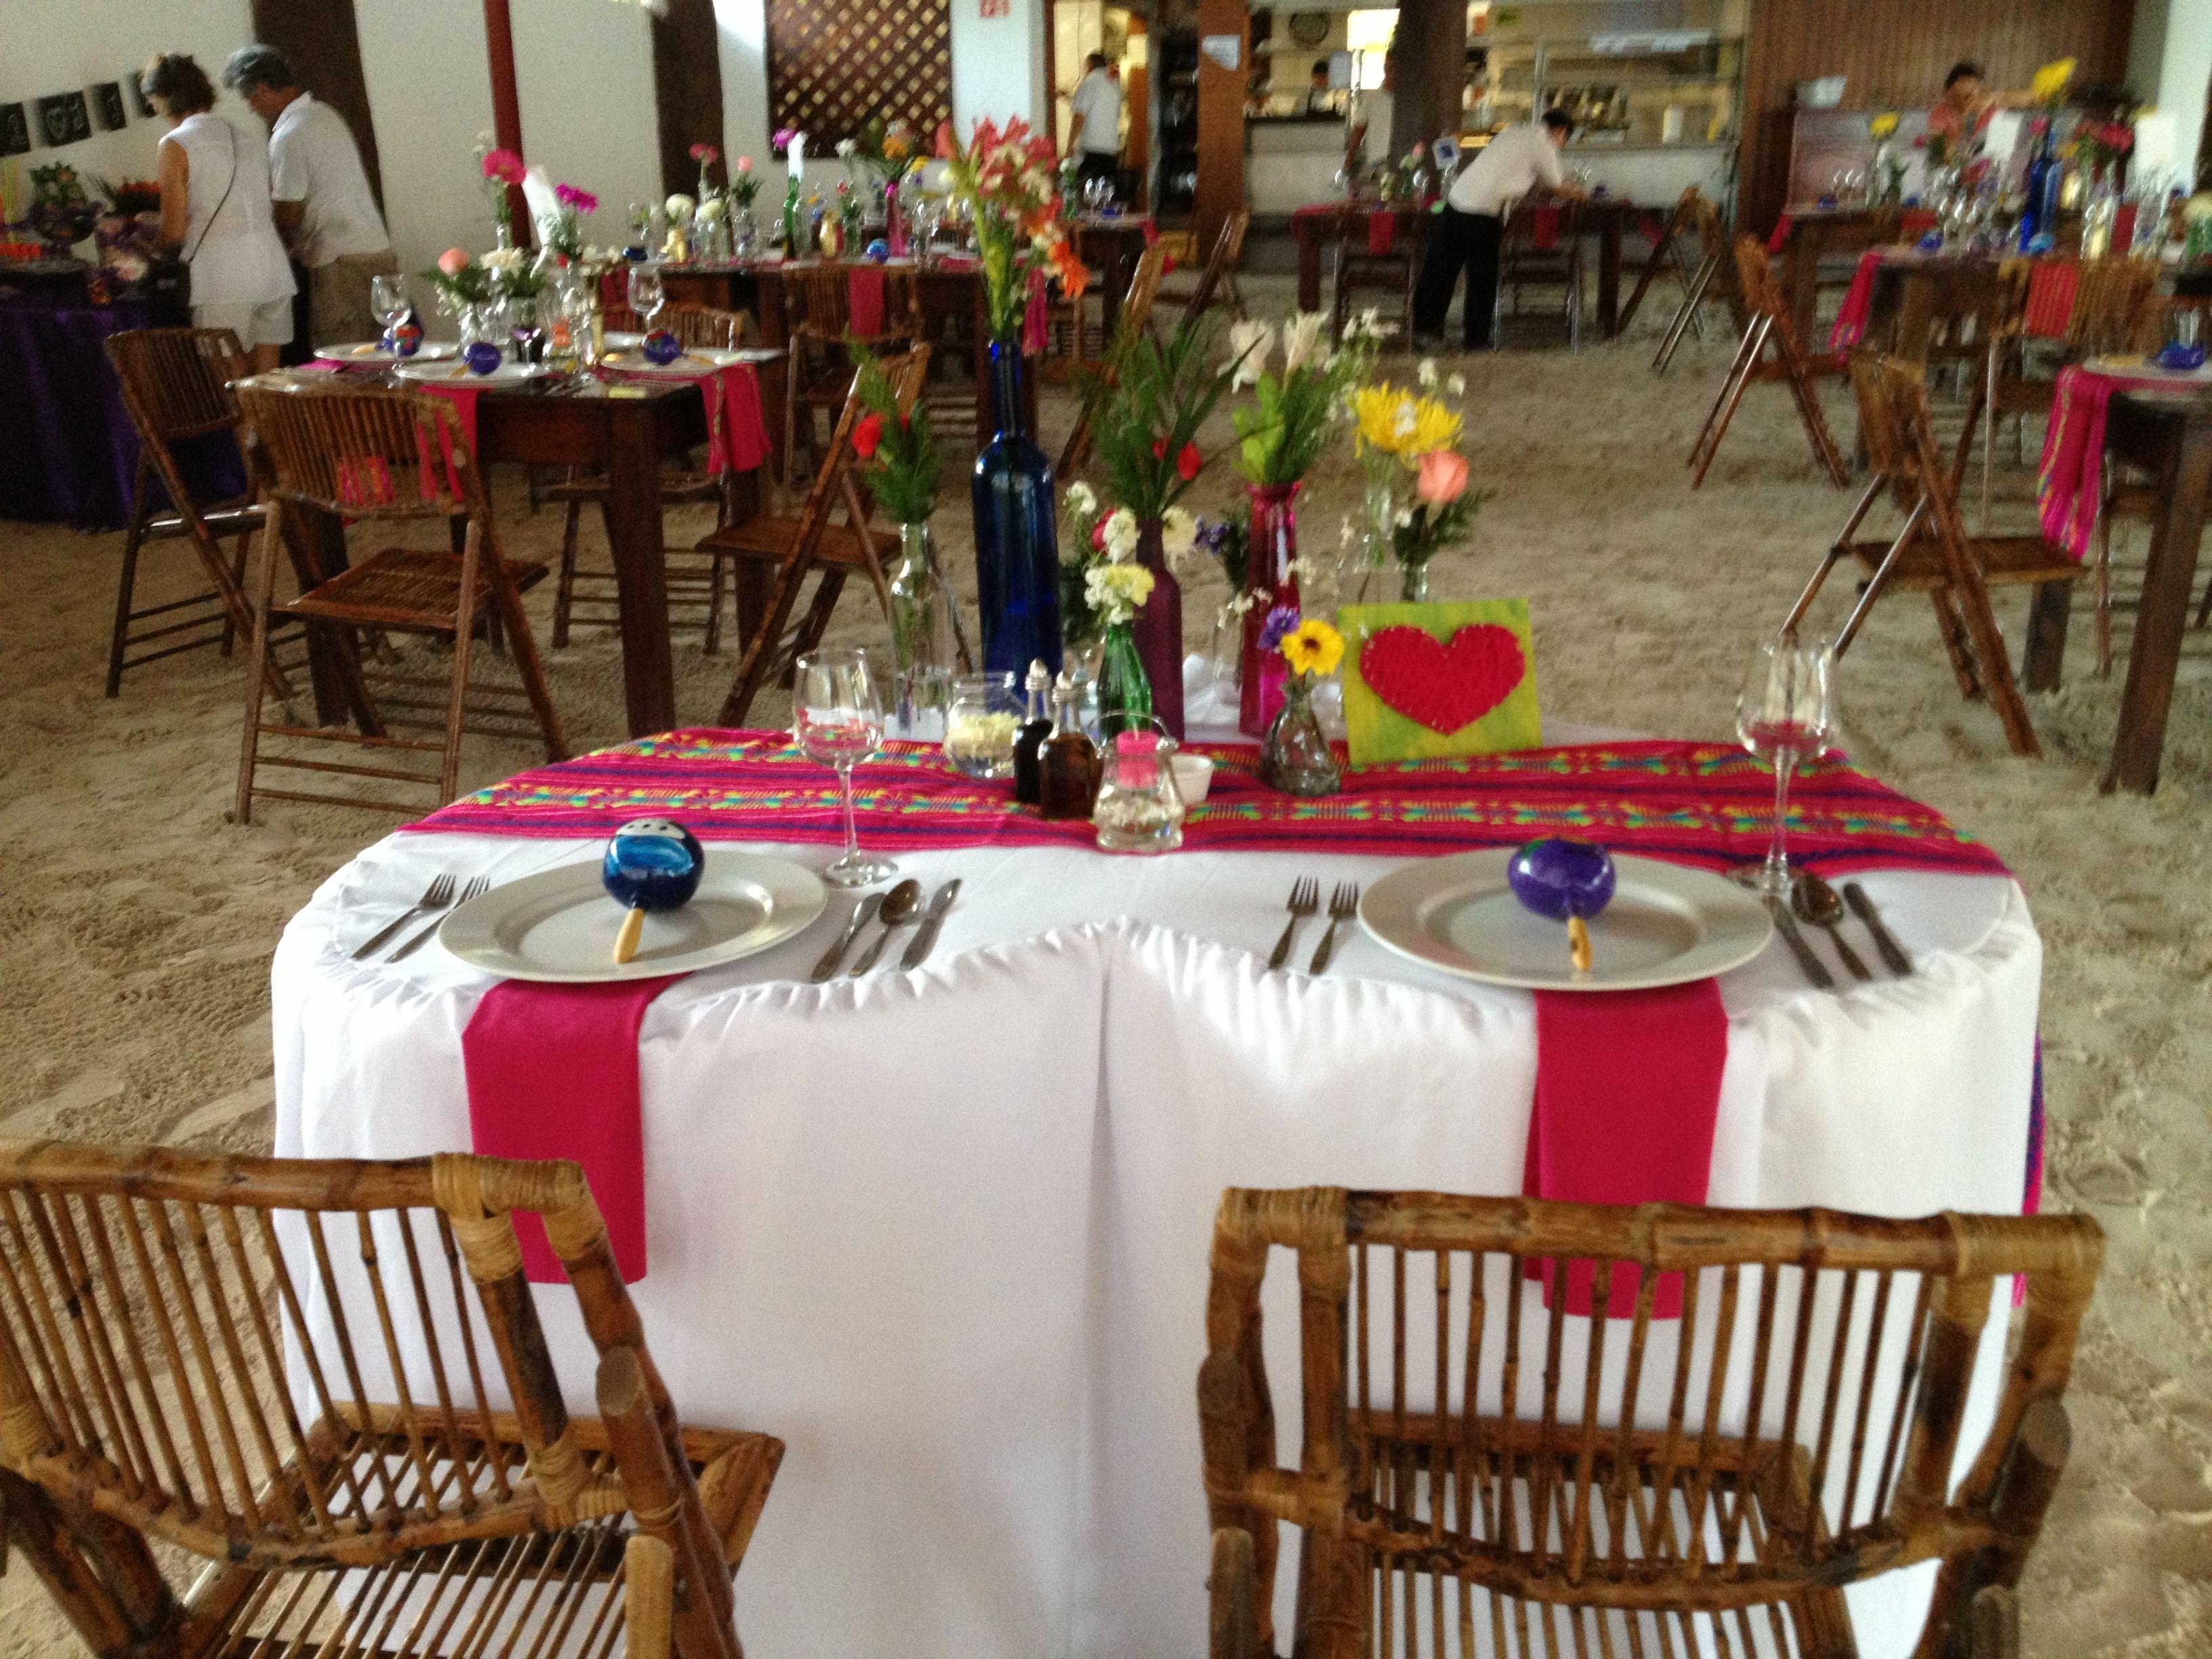 Decoraci n en mesas al estilo de m xico boda mexicana for Decoracion mexicana